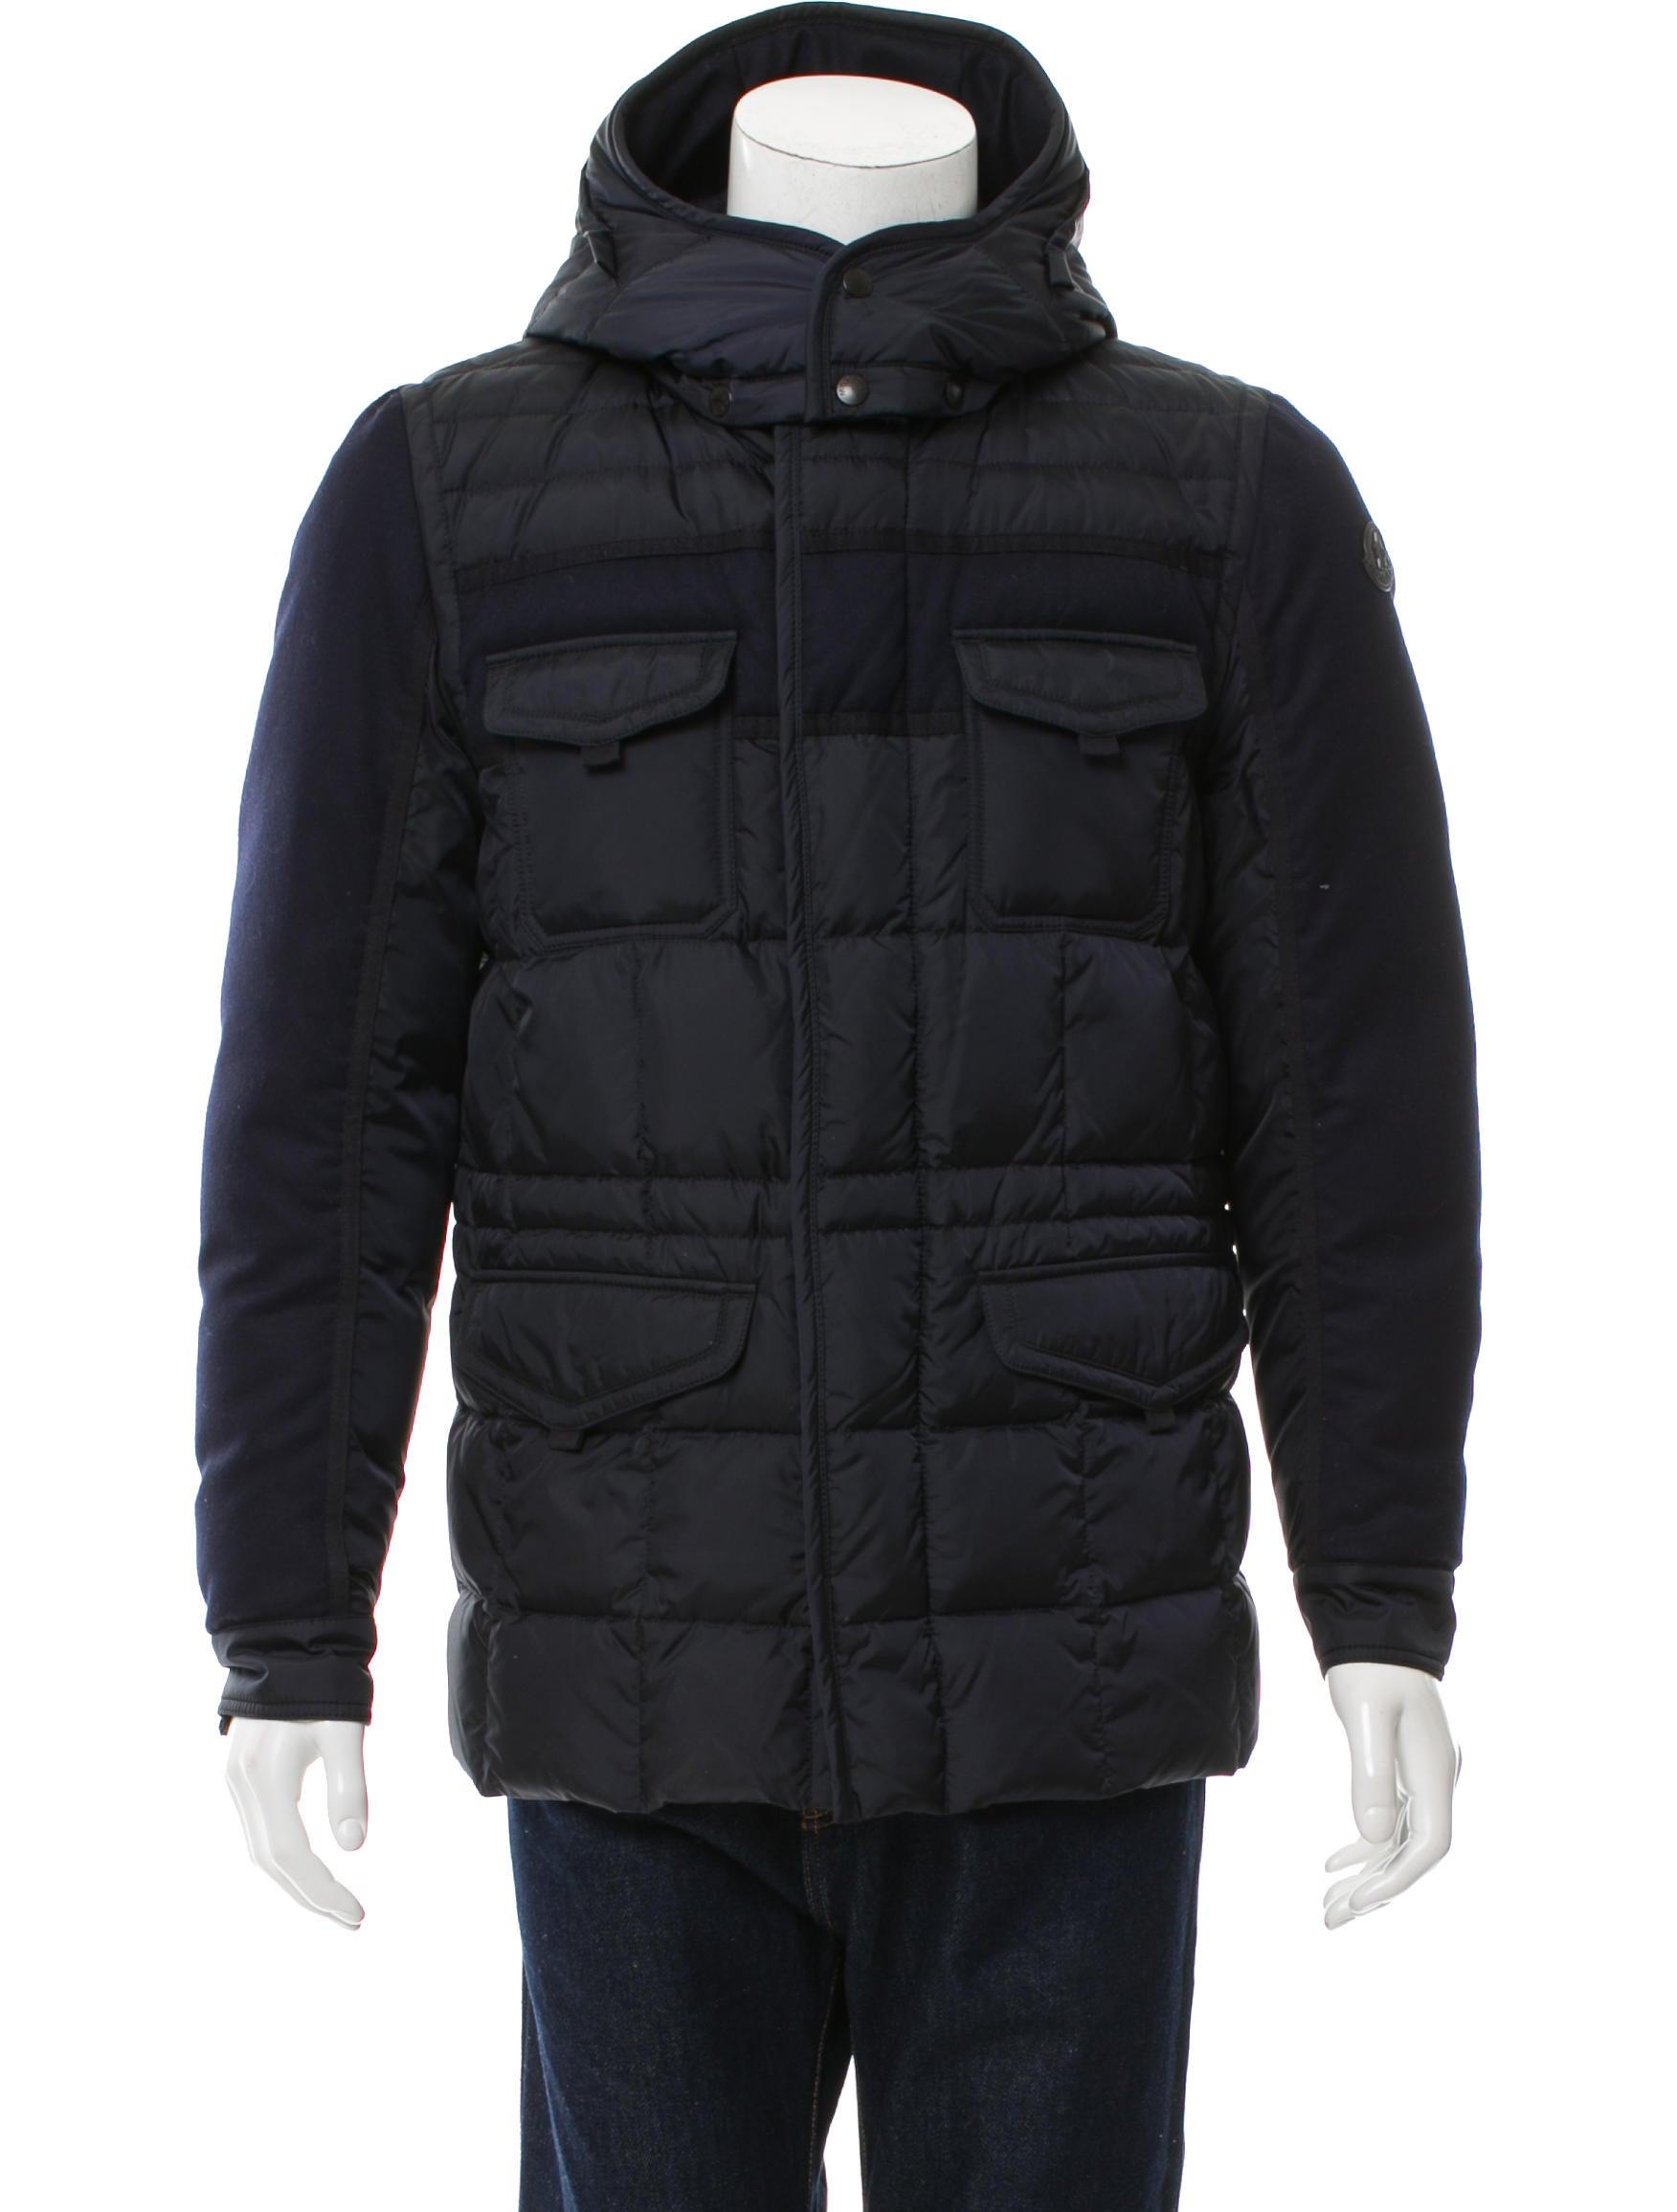 dd374305b3ede Moncler Jacob Mixed-Media Down Field Jacket - Clothing - MOC24059 ...